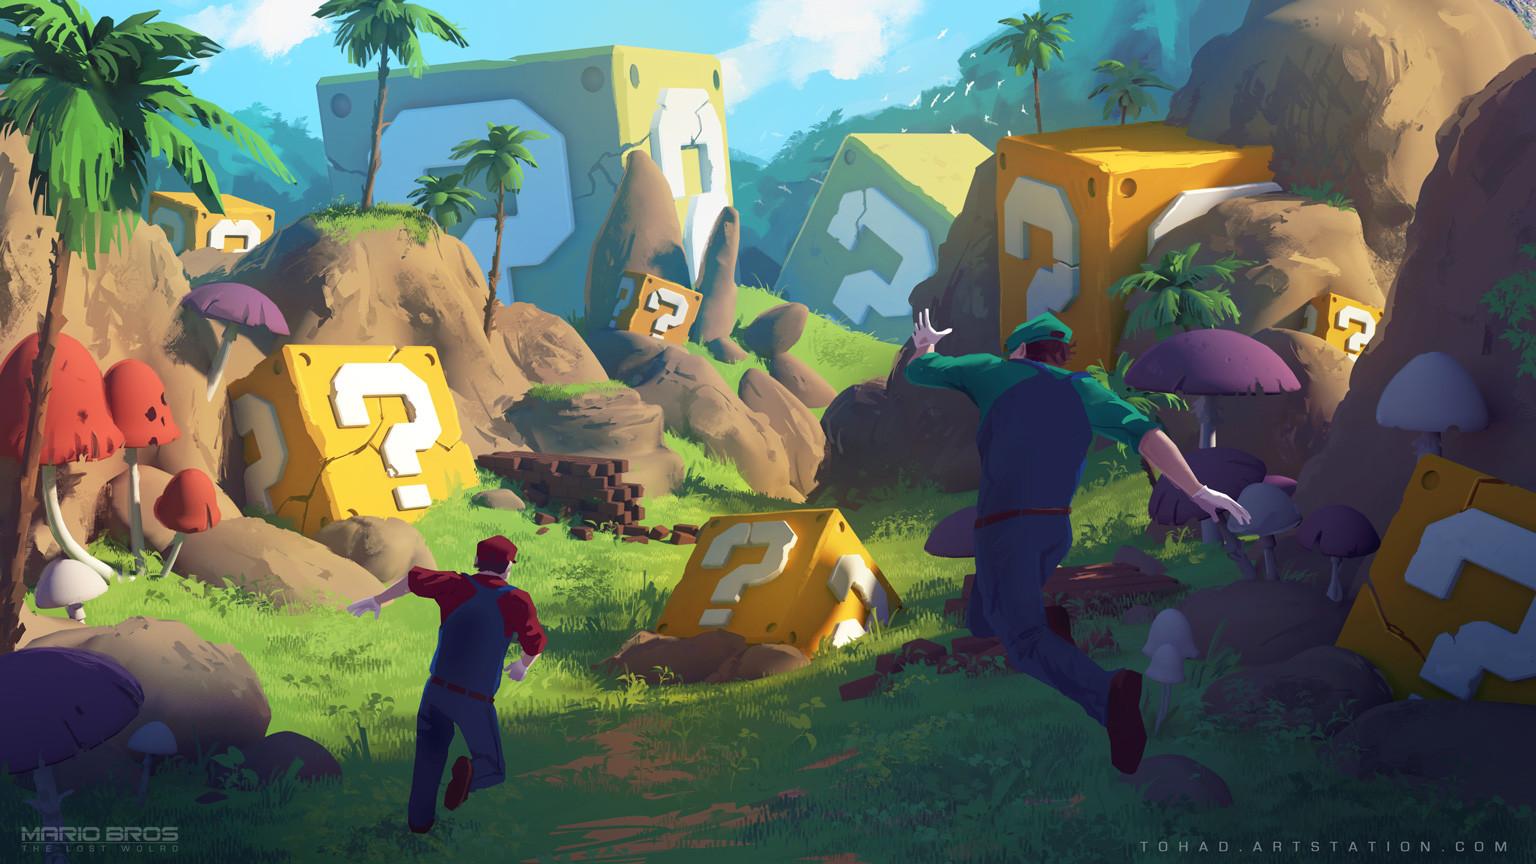 Mario Bros : The Lost World, environment concept